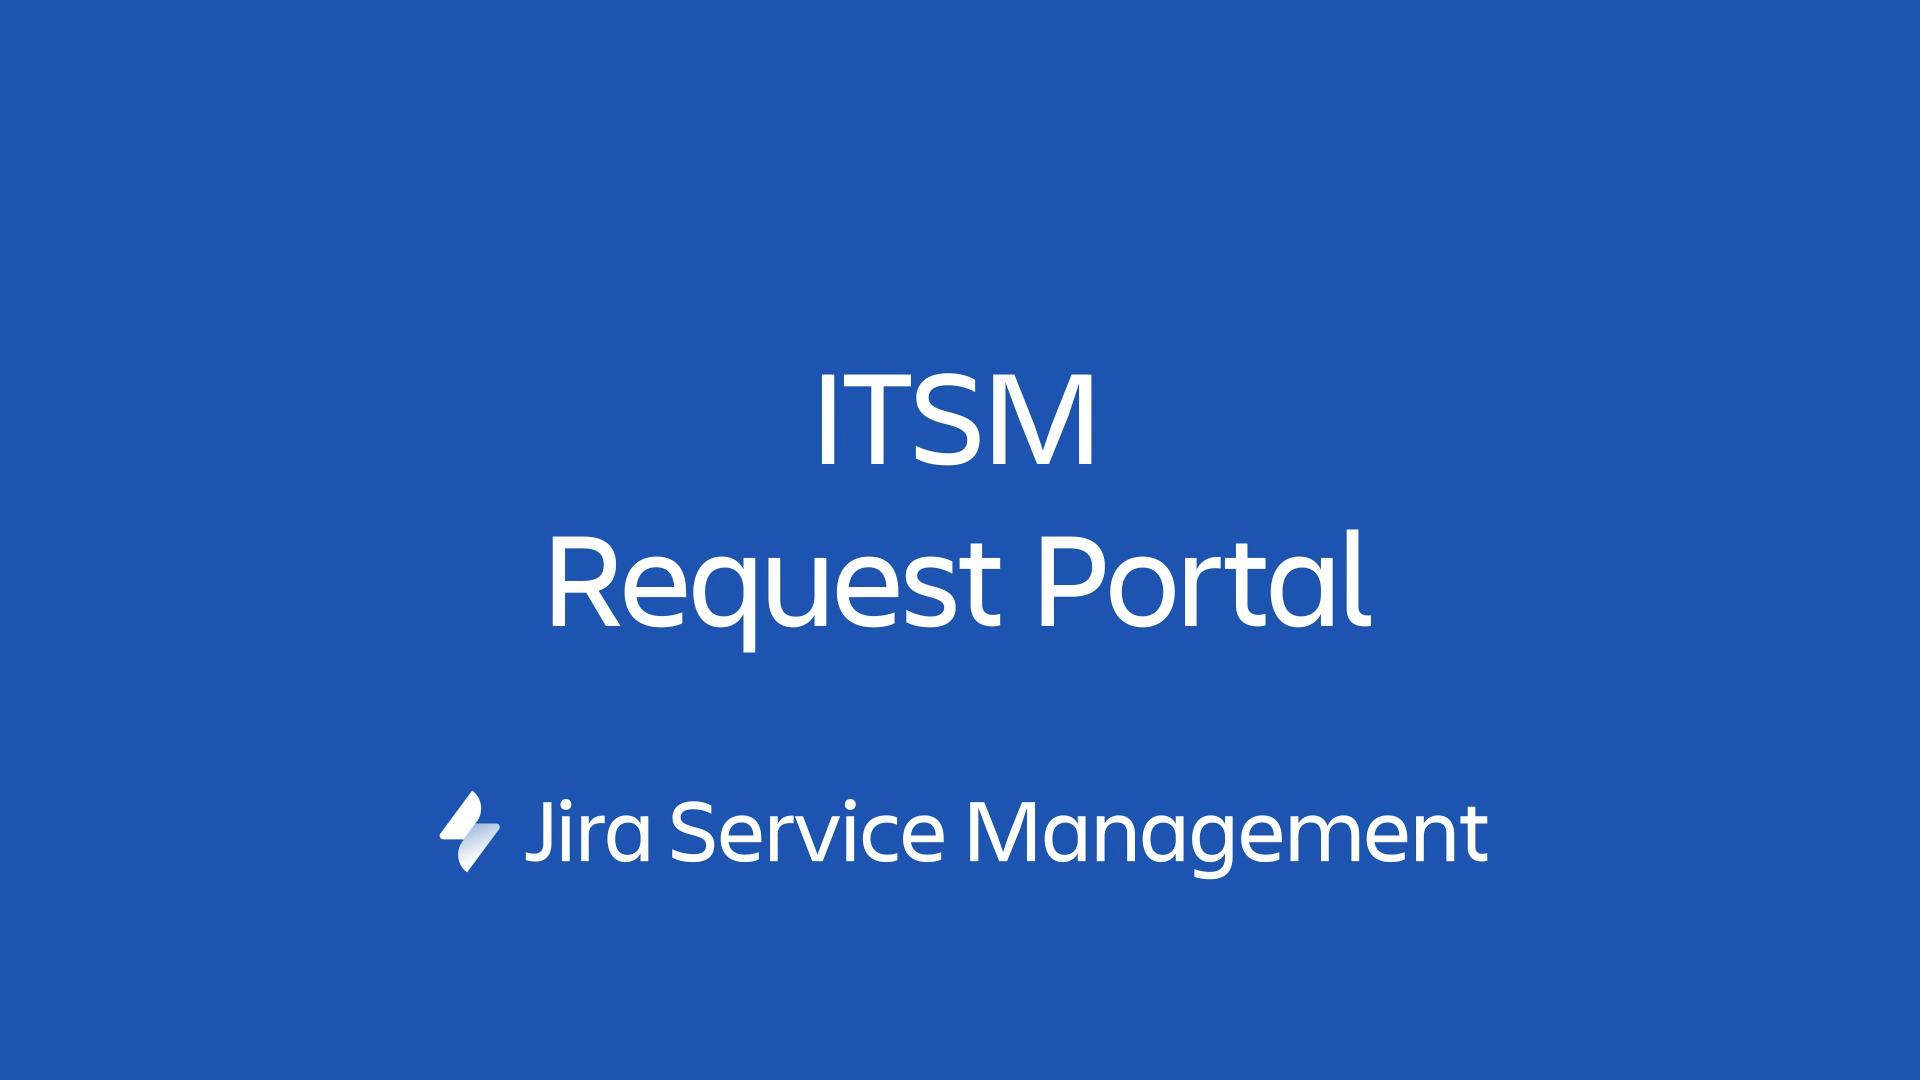 Jira Service Management의 ITSM 요청 포털